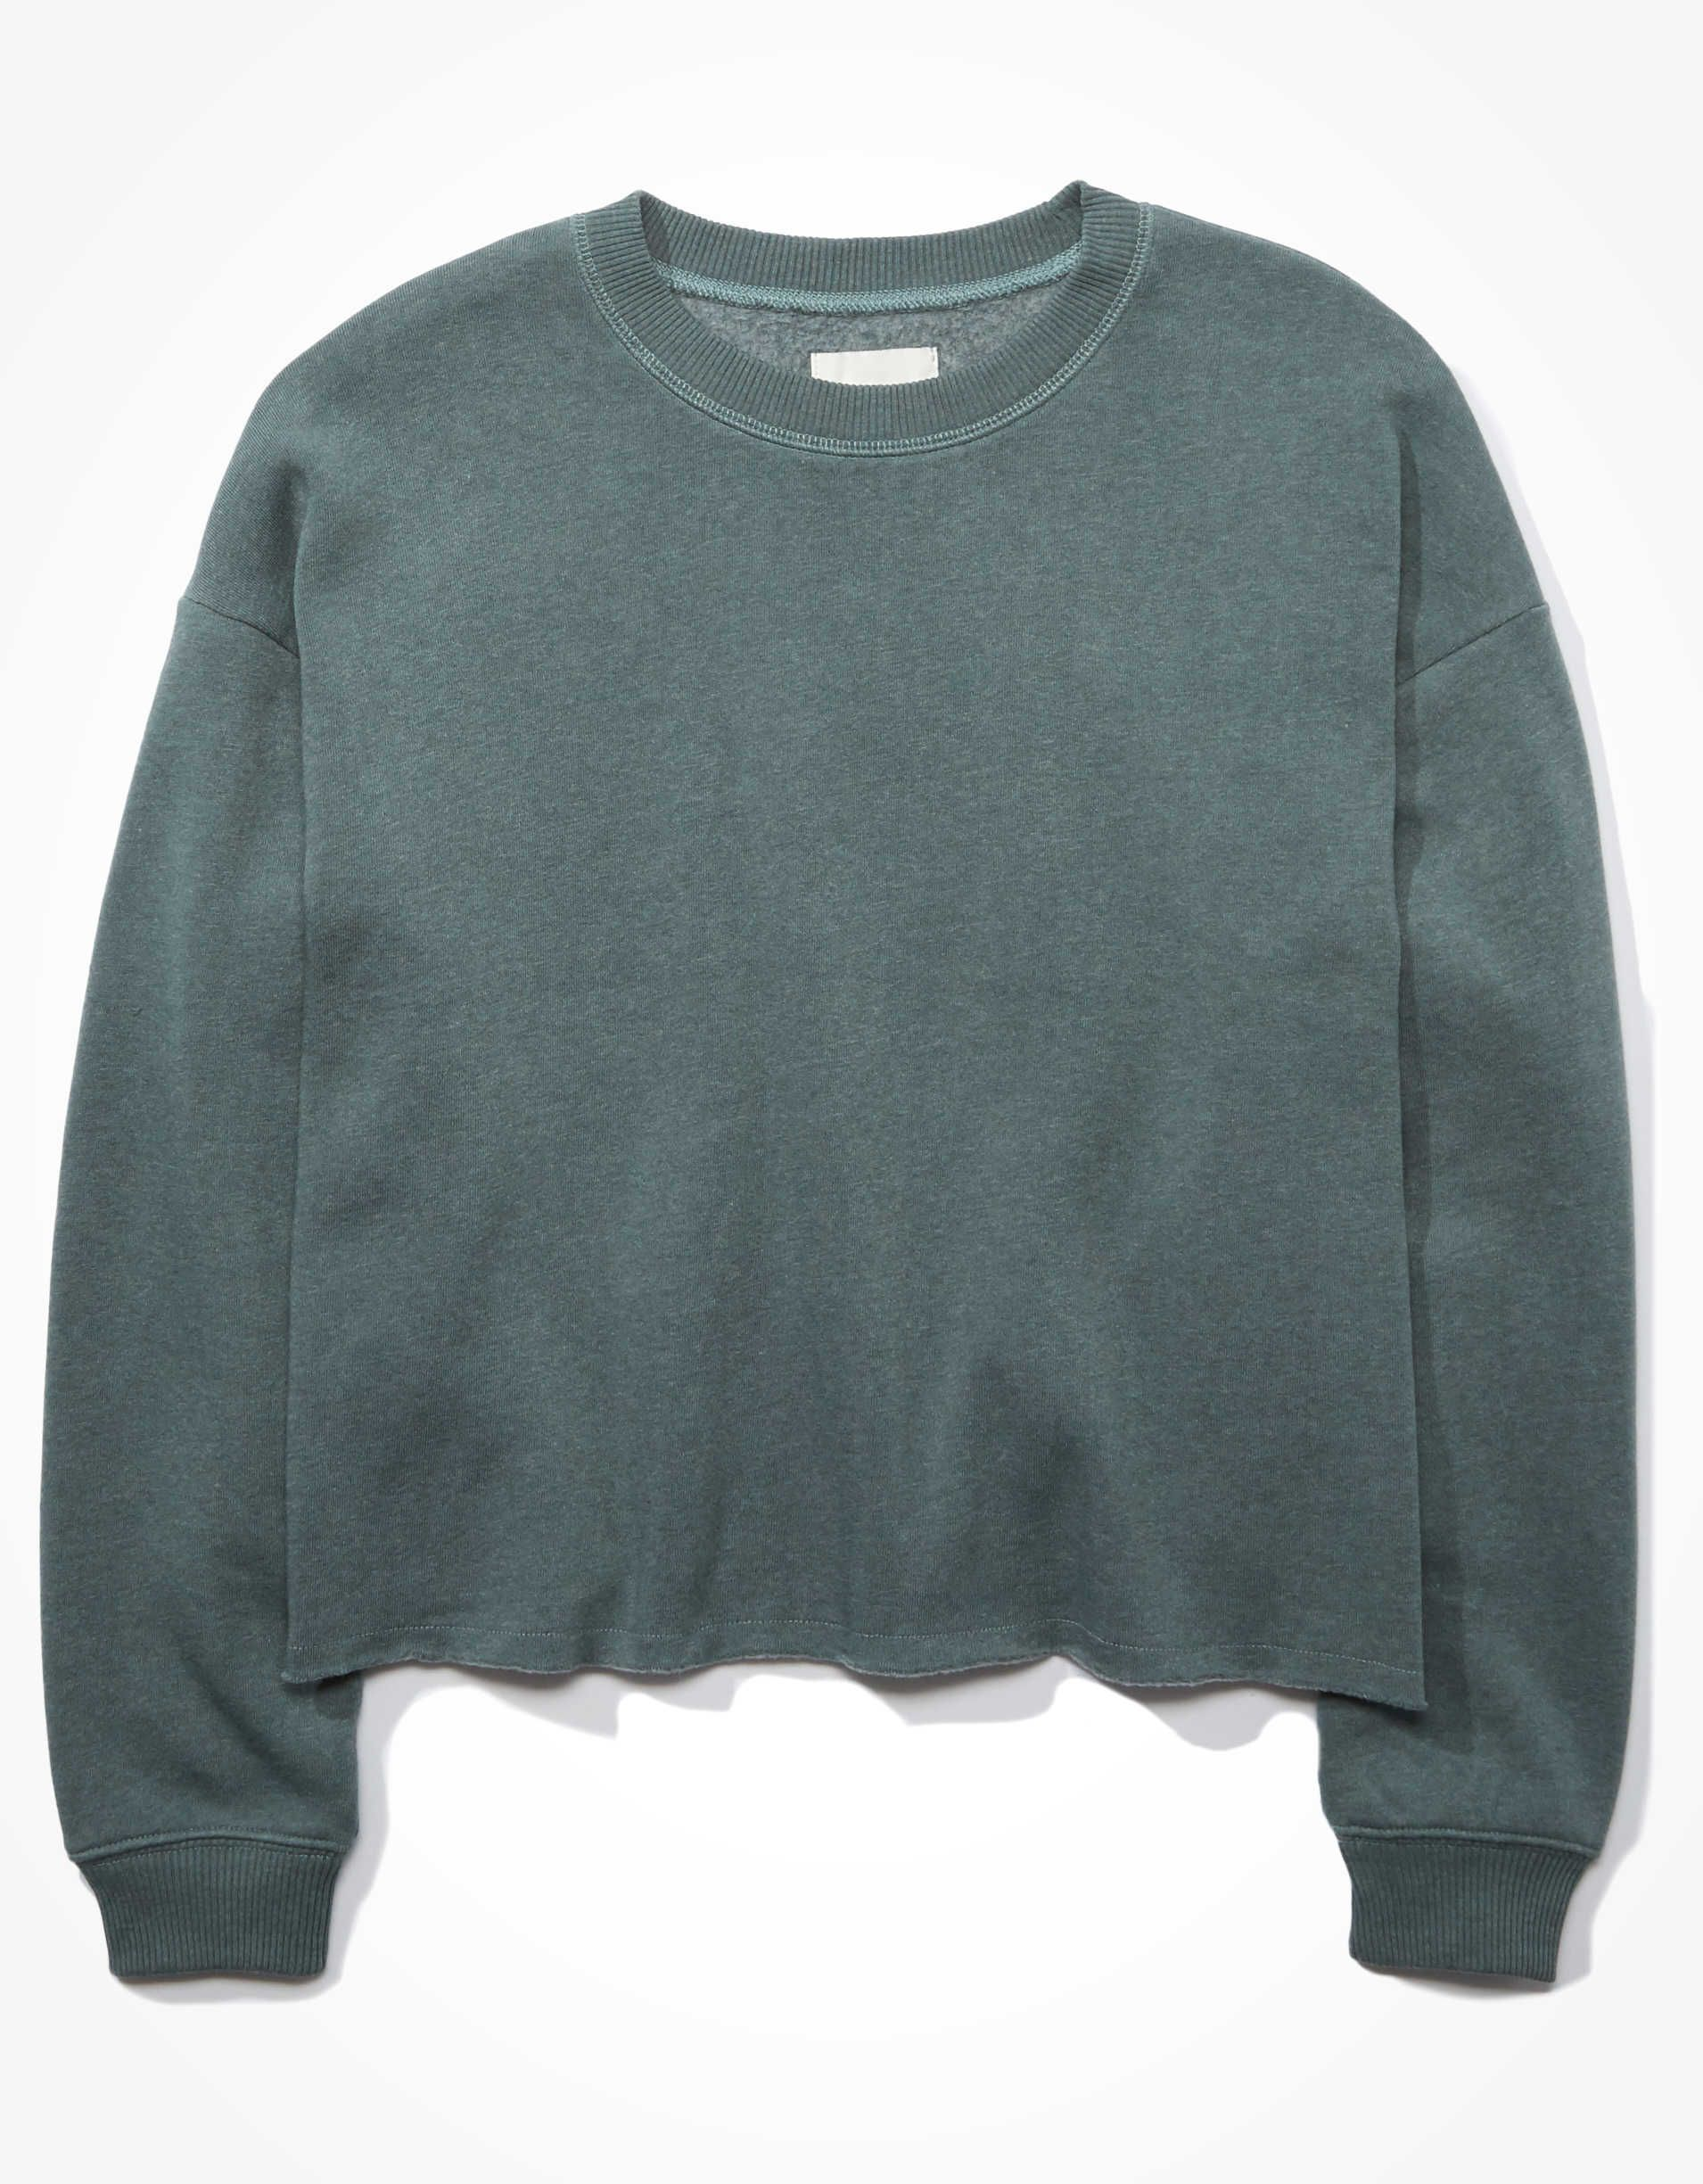 Ae Forever Cutoff Crew Neck Sweatshirt Crew Neck Sweaters Women Sweatshirts Crew Neck Sweatshirt [ 2449 x 1910 Pixel ]